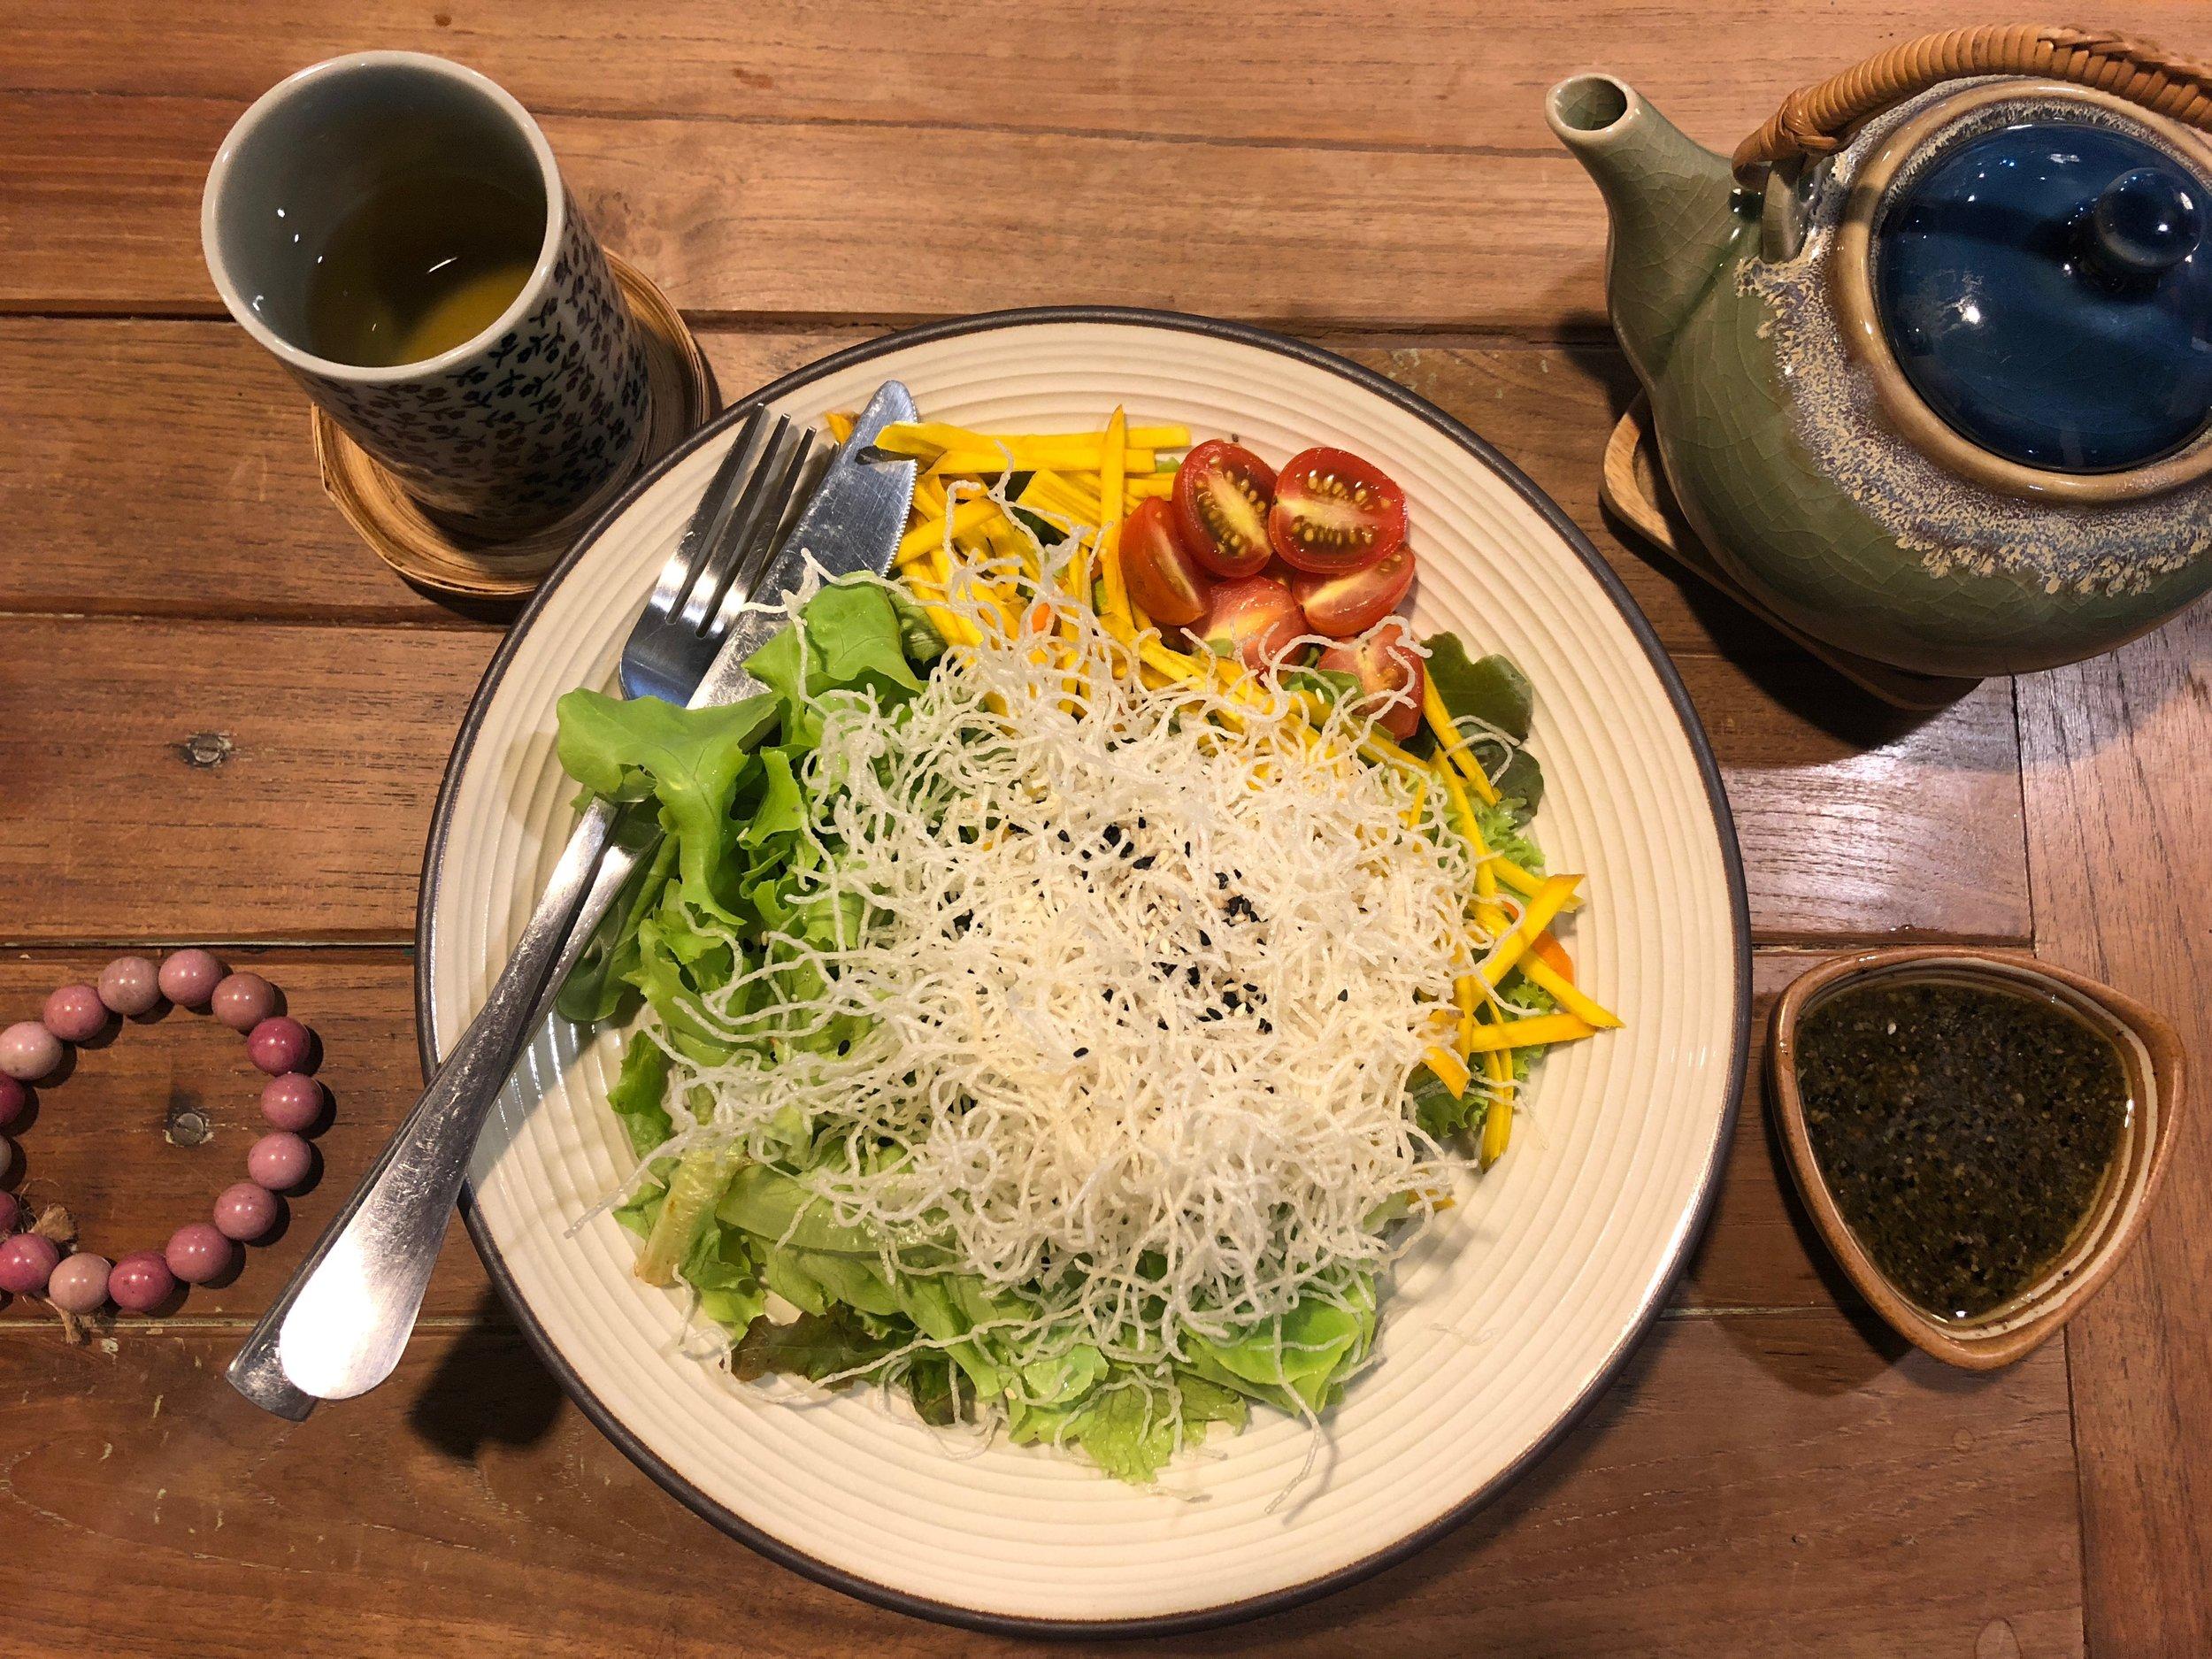 samui_health_shop_brown_rice_bowl.jpg